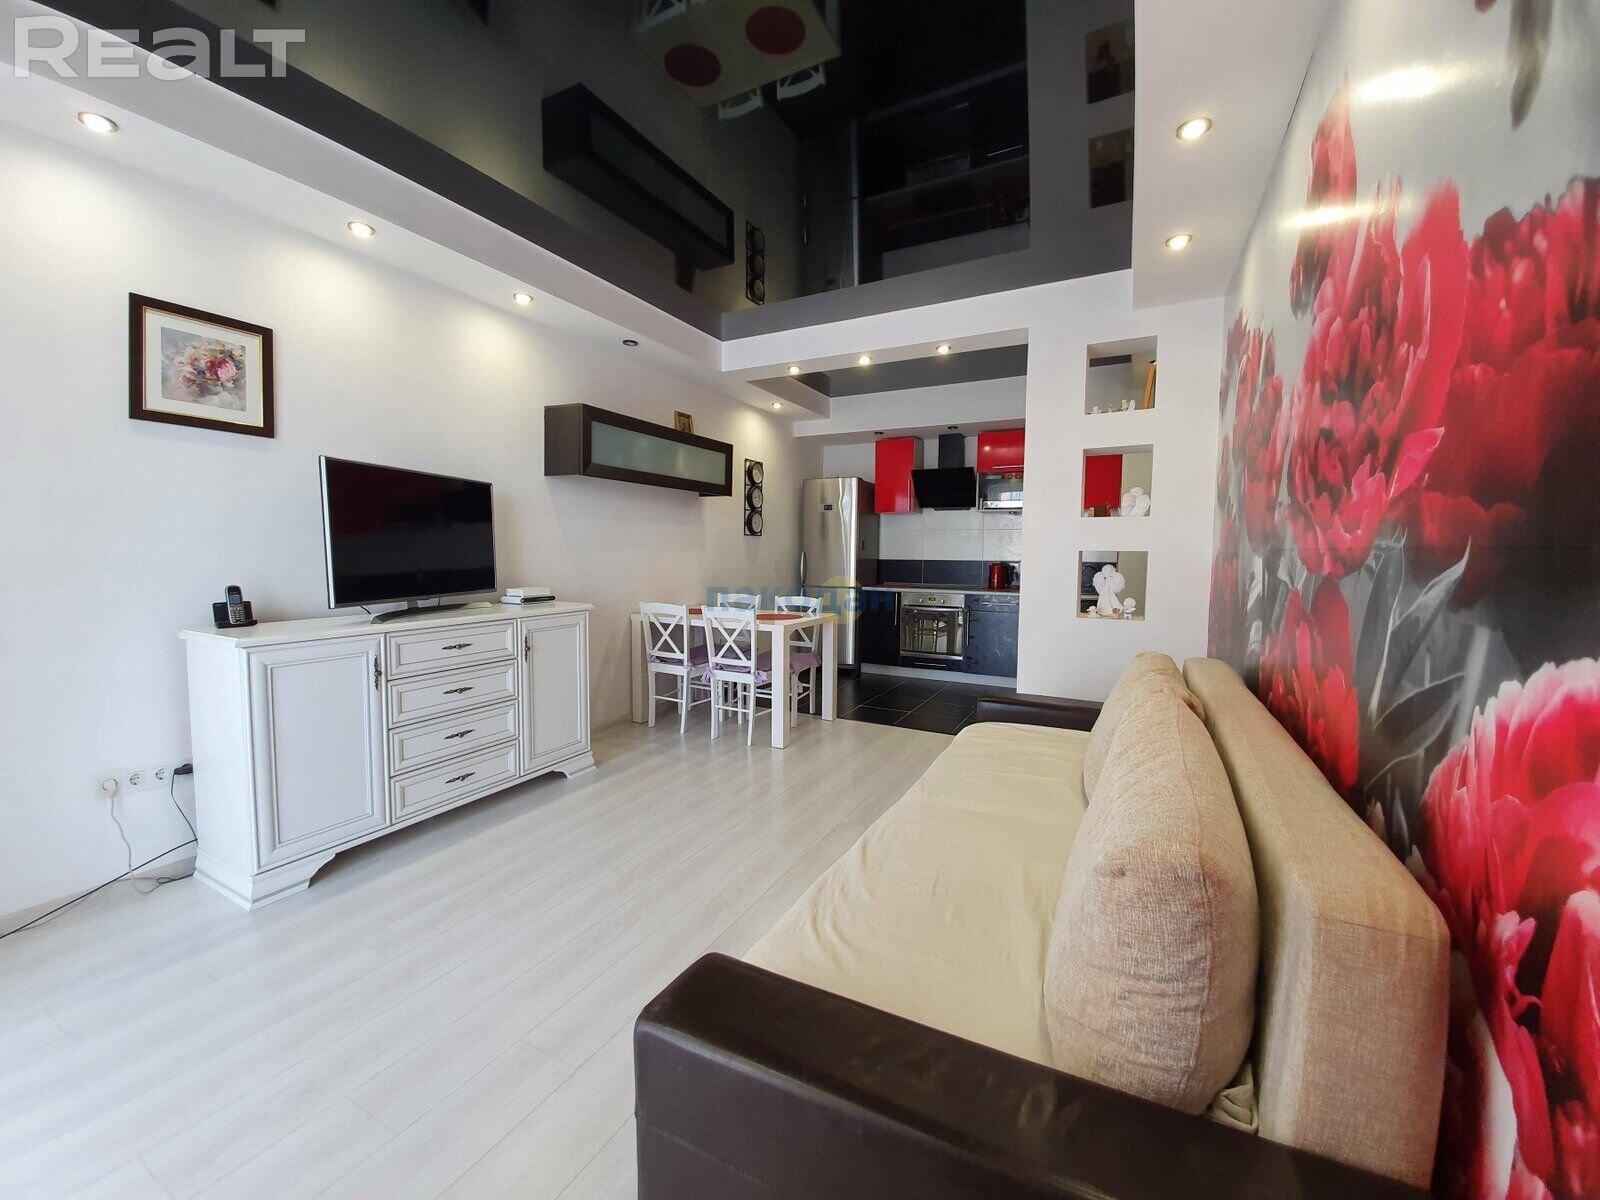 Продается 2-х комнатная квартира, Копище - фото №4